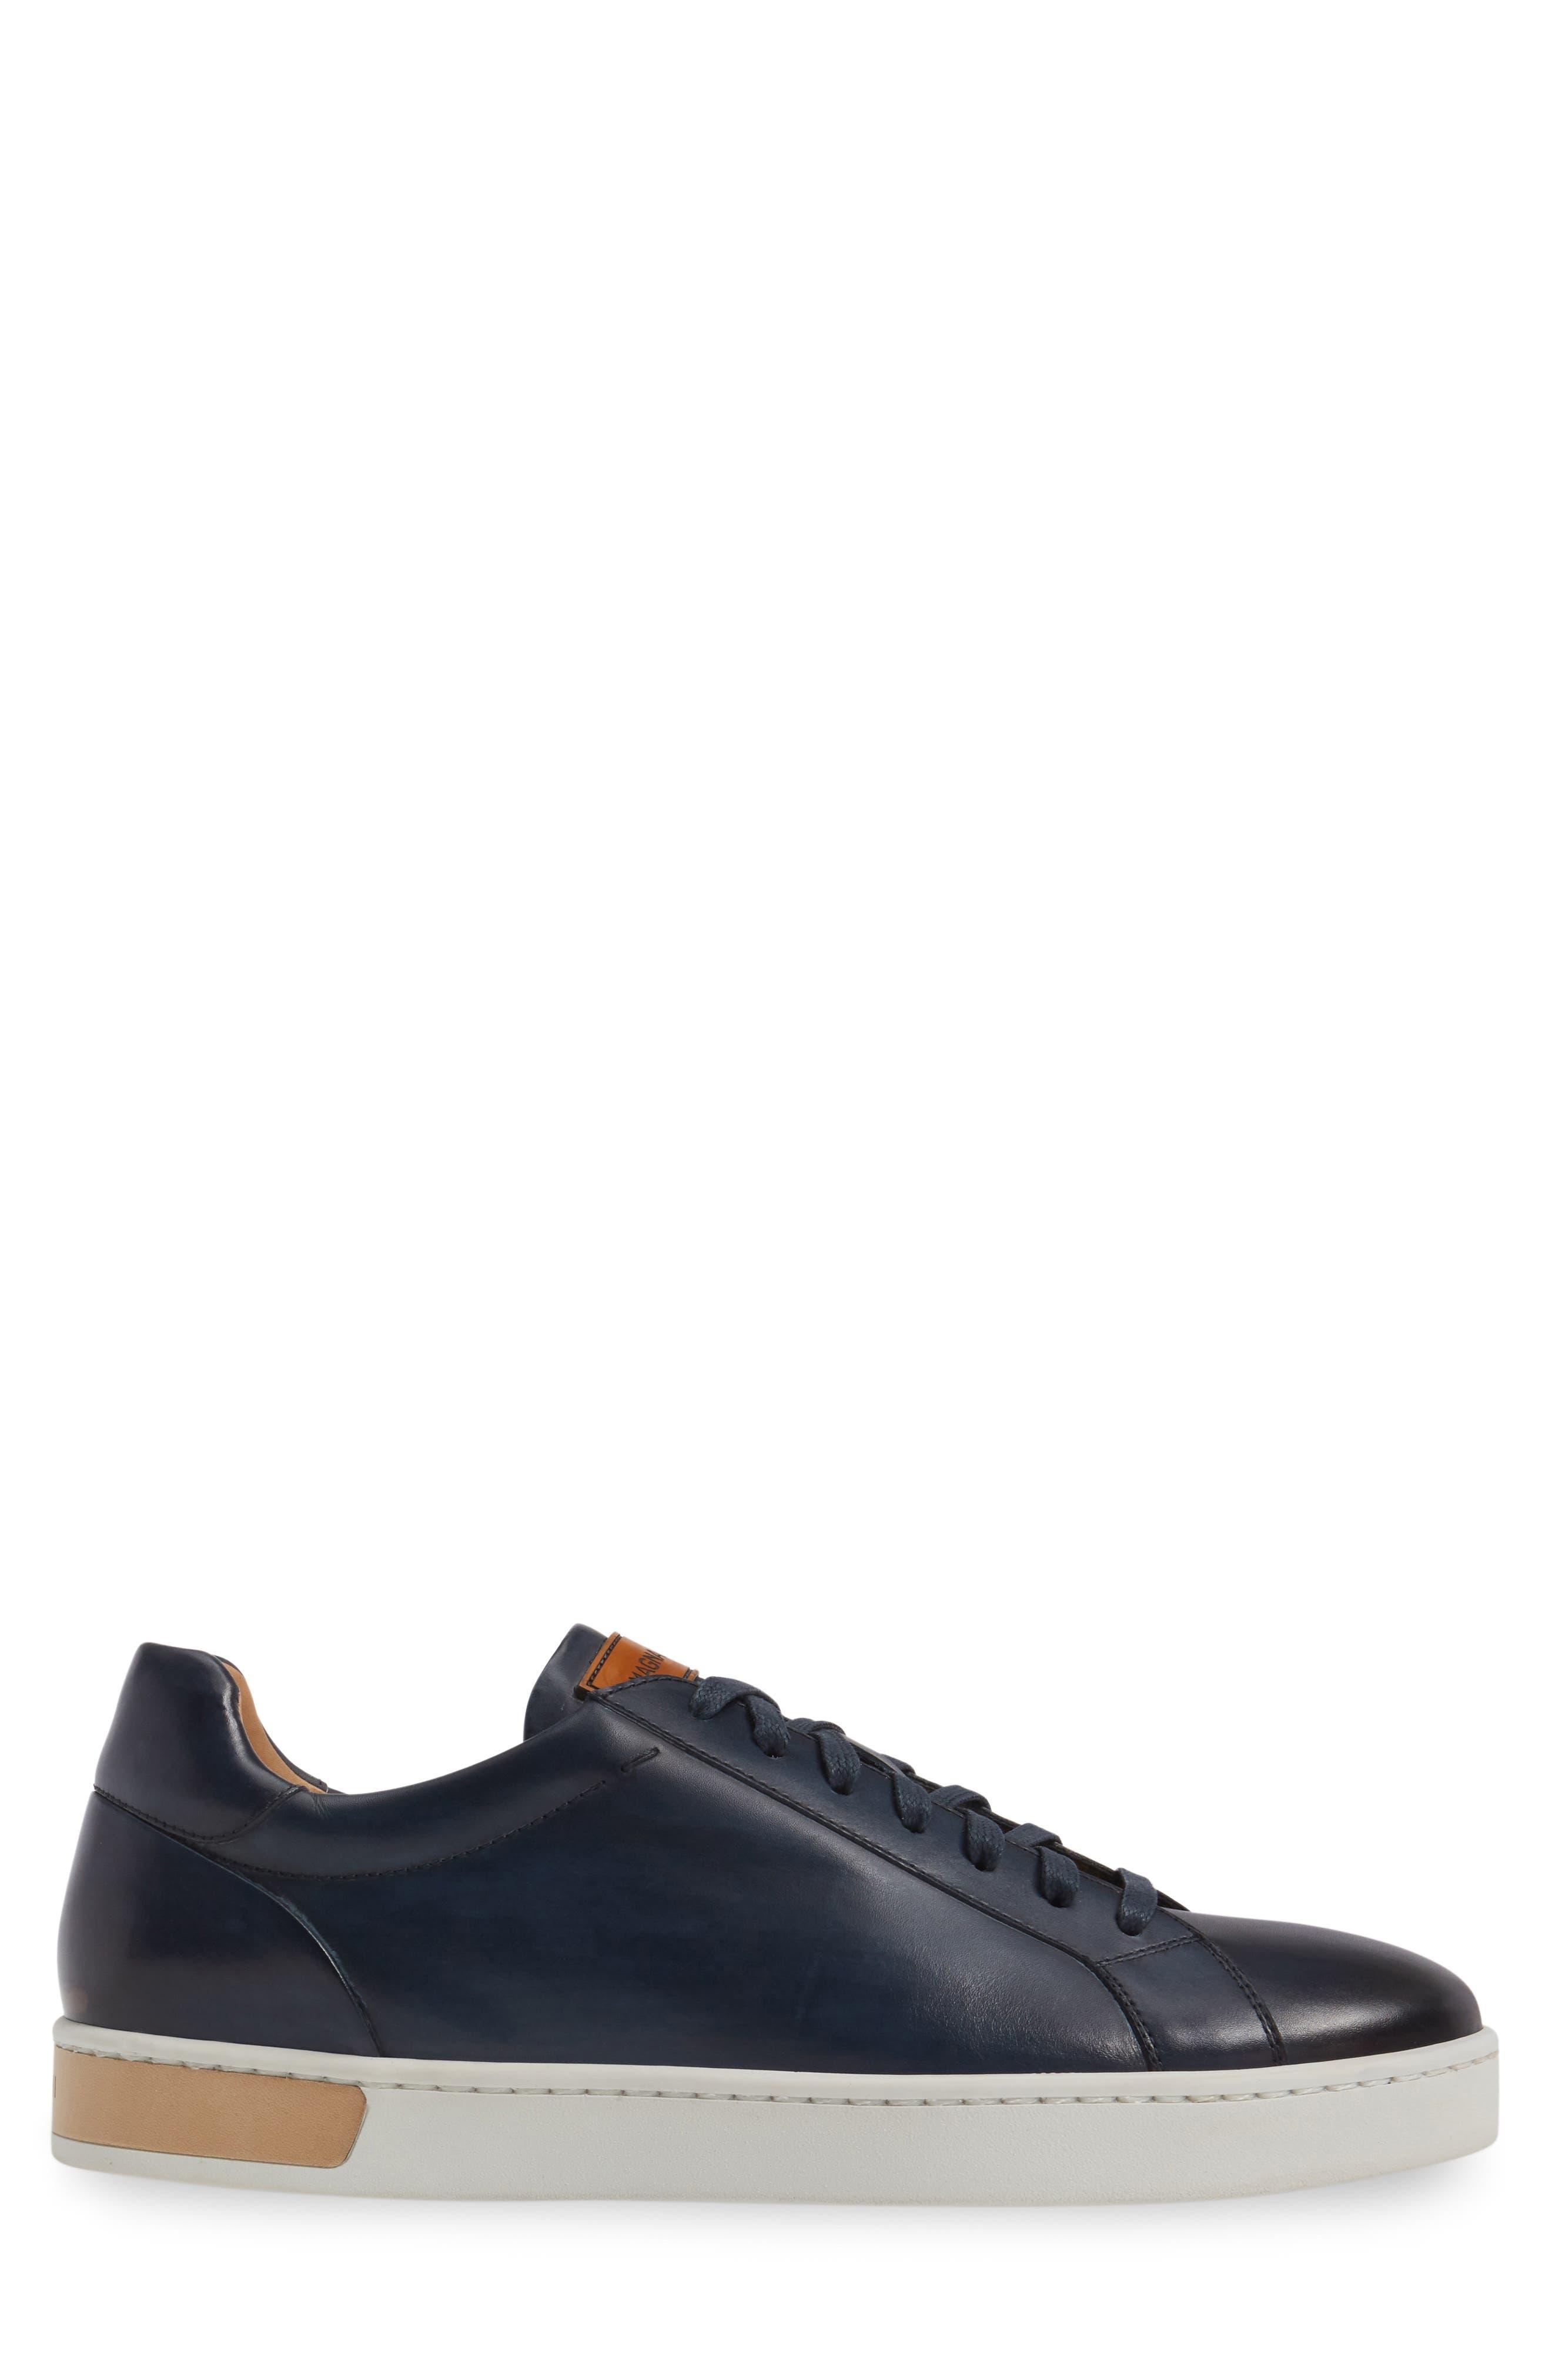 Alternate Image 3  - Magnanni Caballero Sneaker (Men)